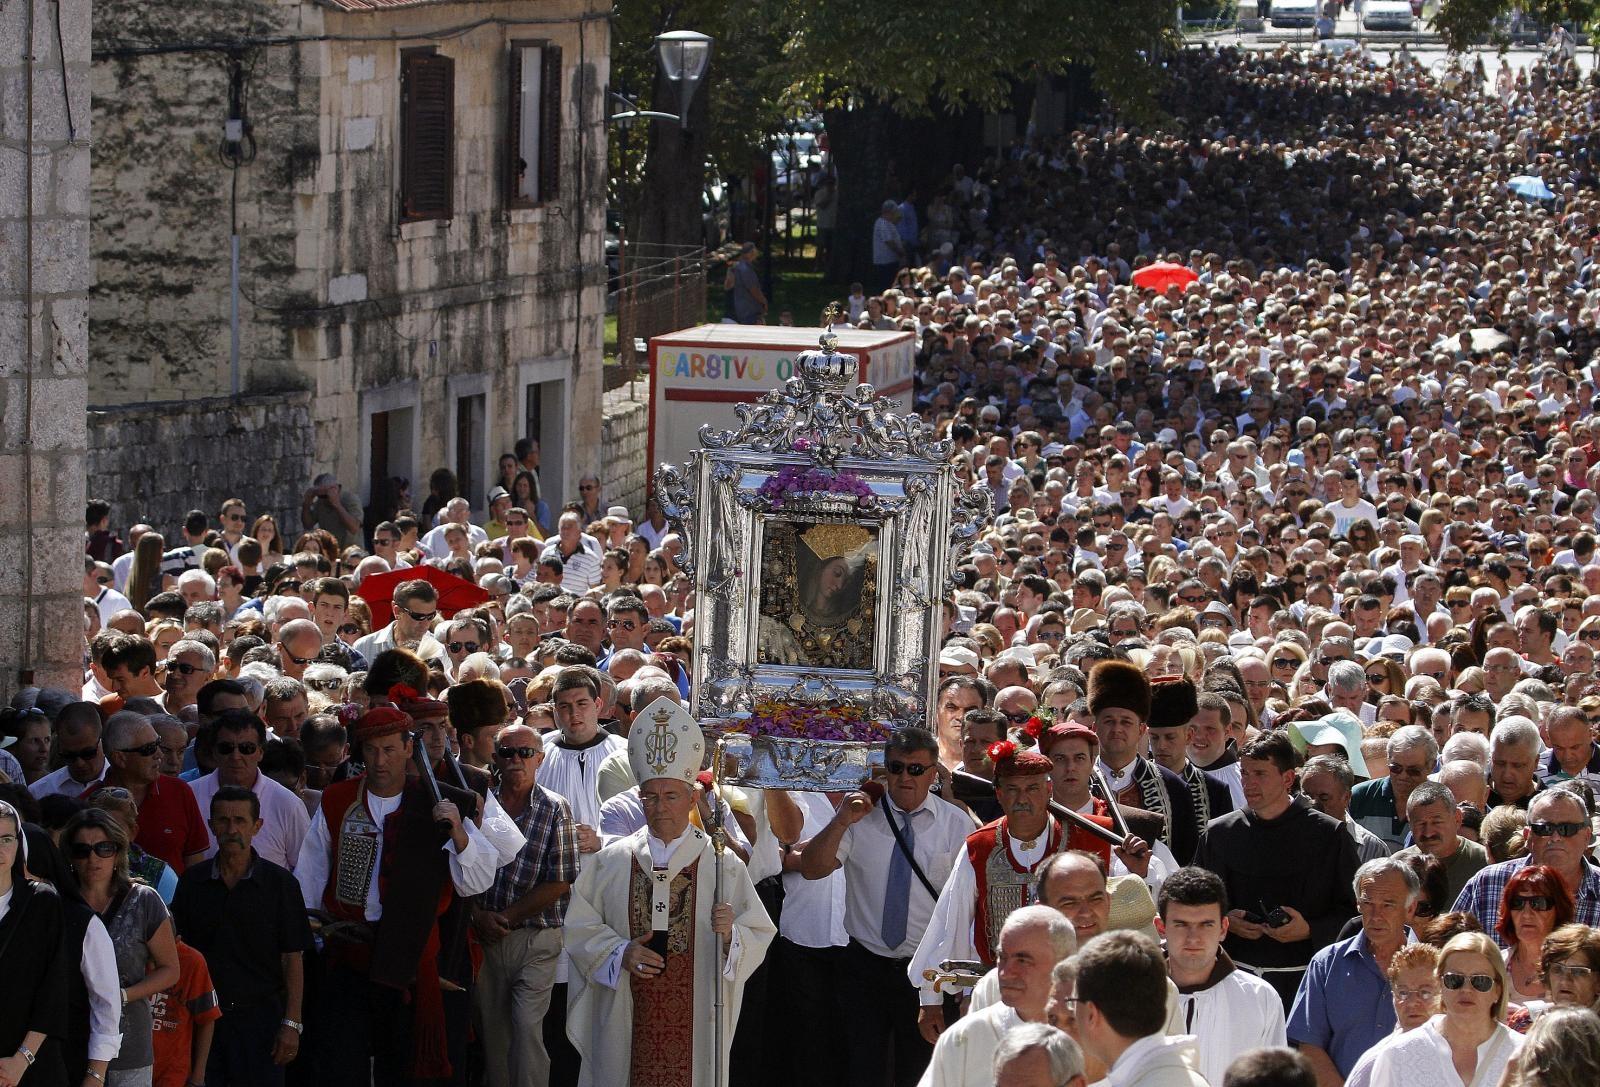 croatians celebrate velika gospa